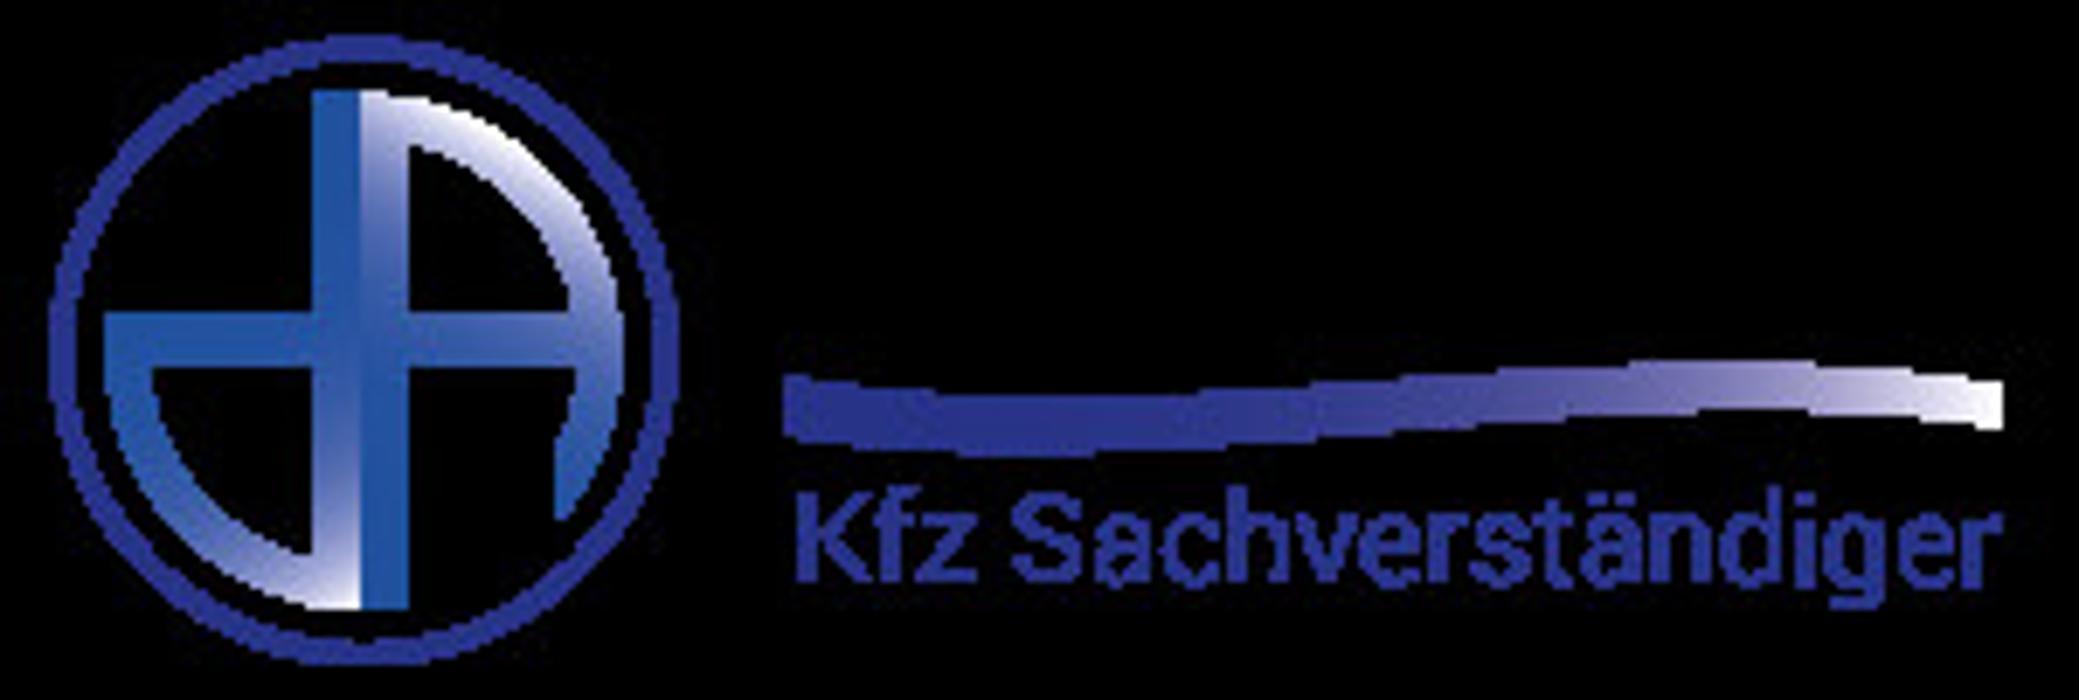 Data-Auto KFZ-Sachverständigenbüro